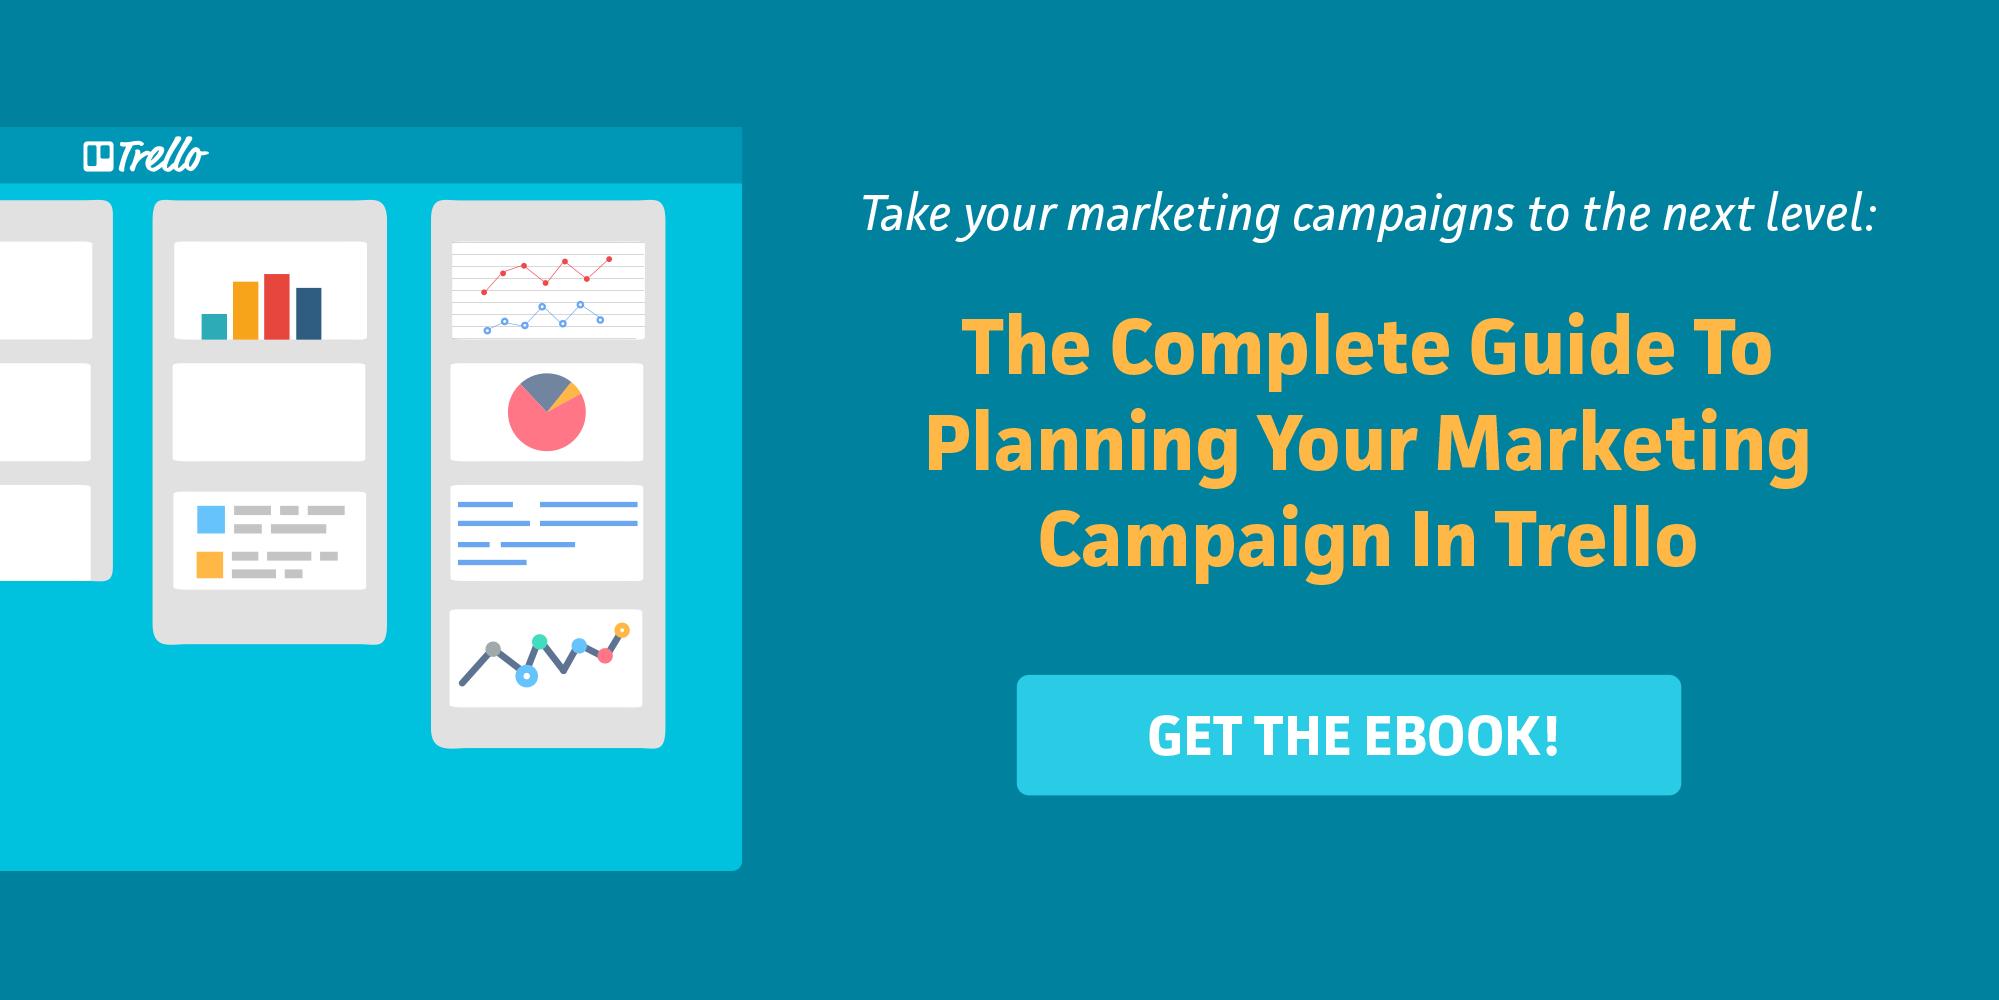 How To Plan A Successful Marketing Campaign In Trello [Ebook]